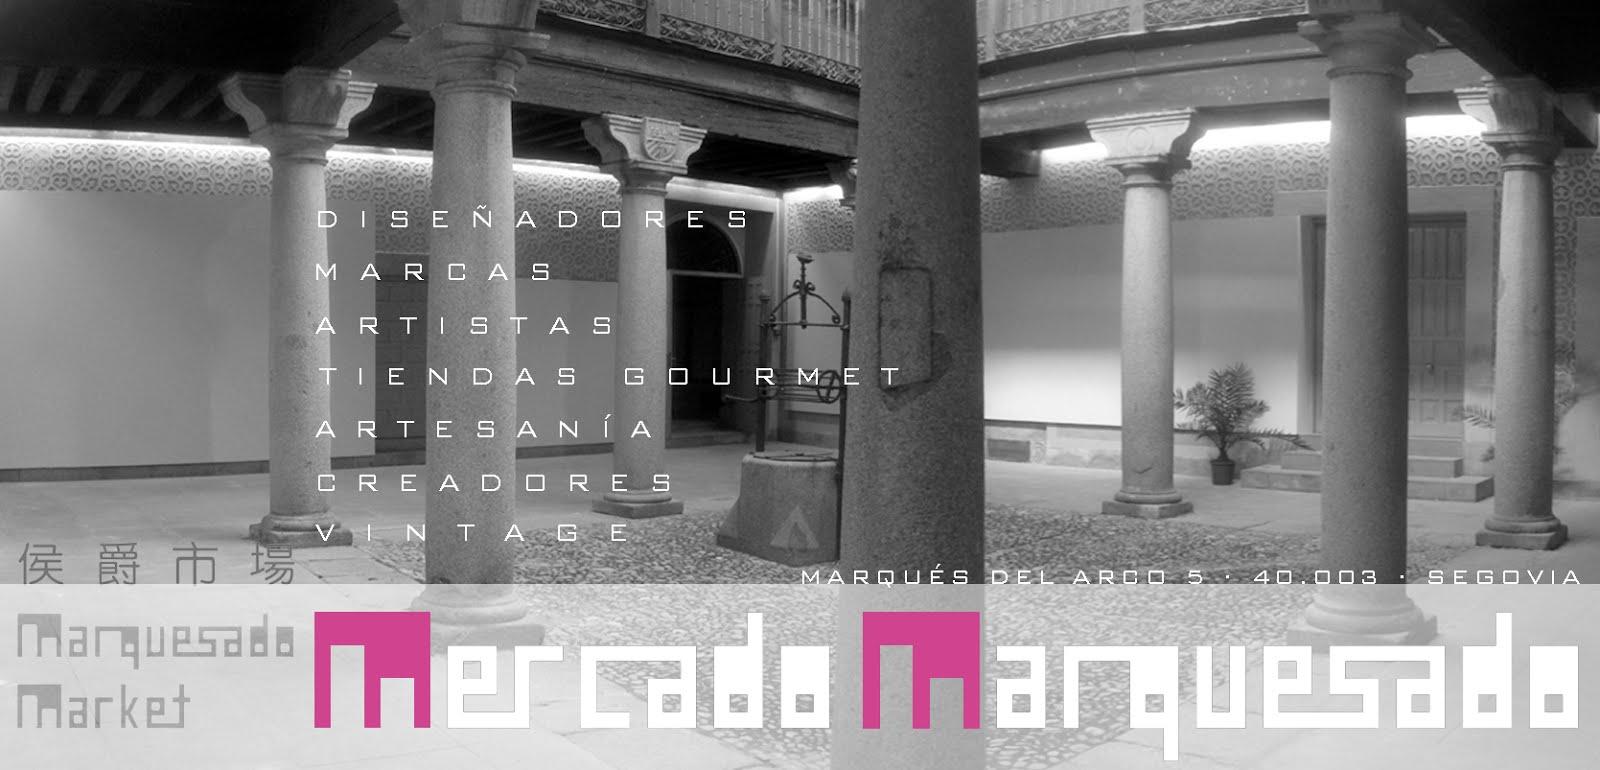 5-6 -7 DICIEMBRE 2015-MARQUESADO-SEGOVIA